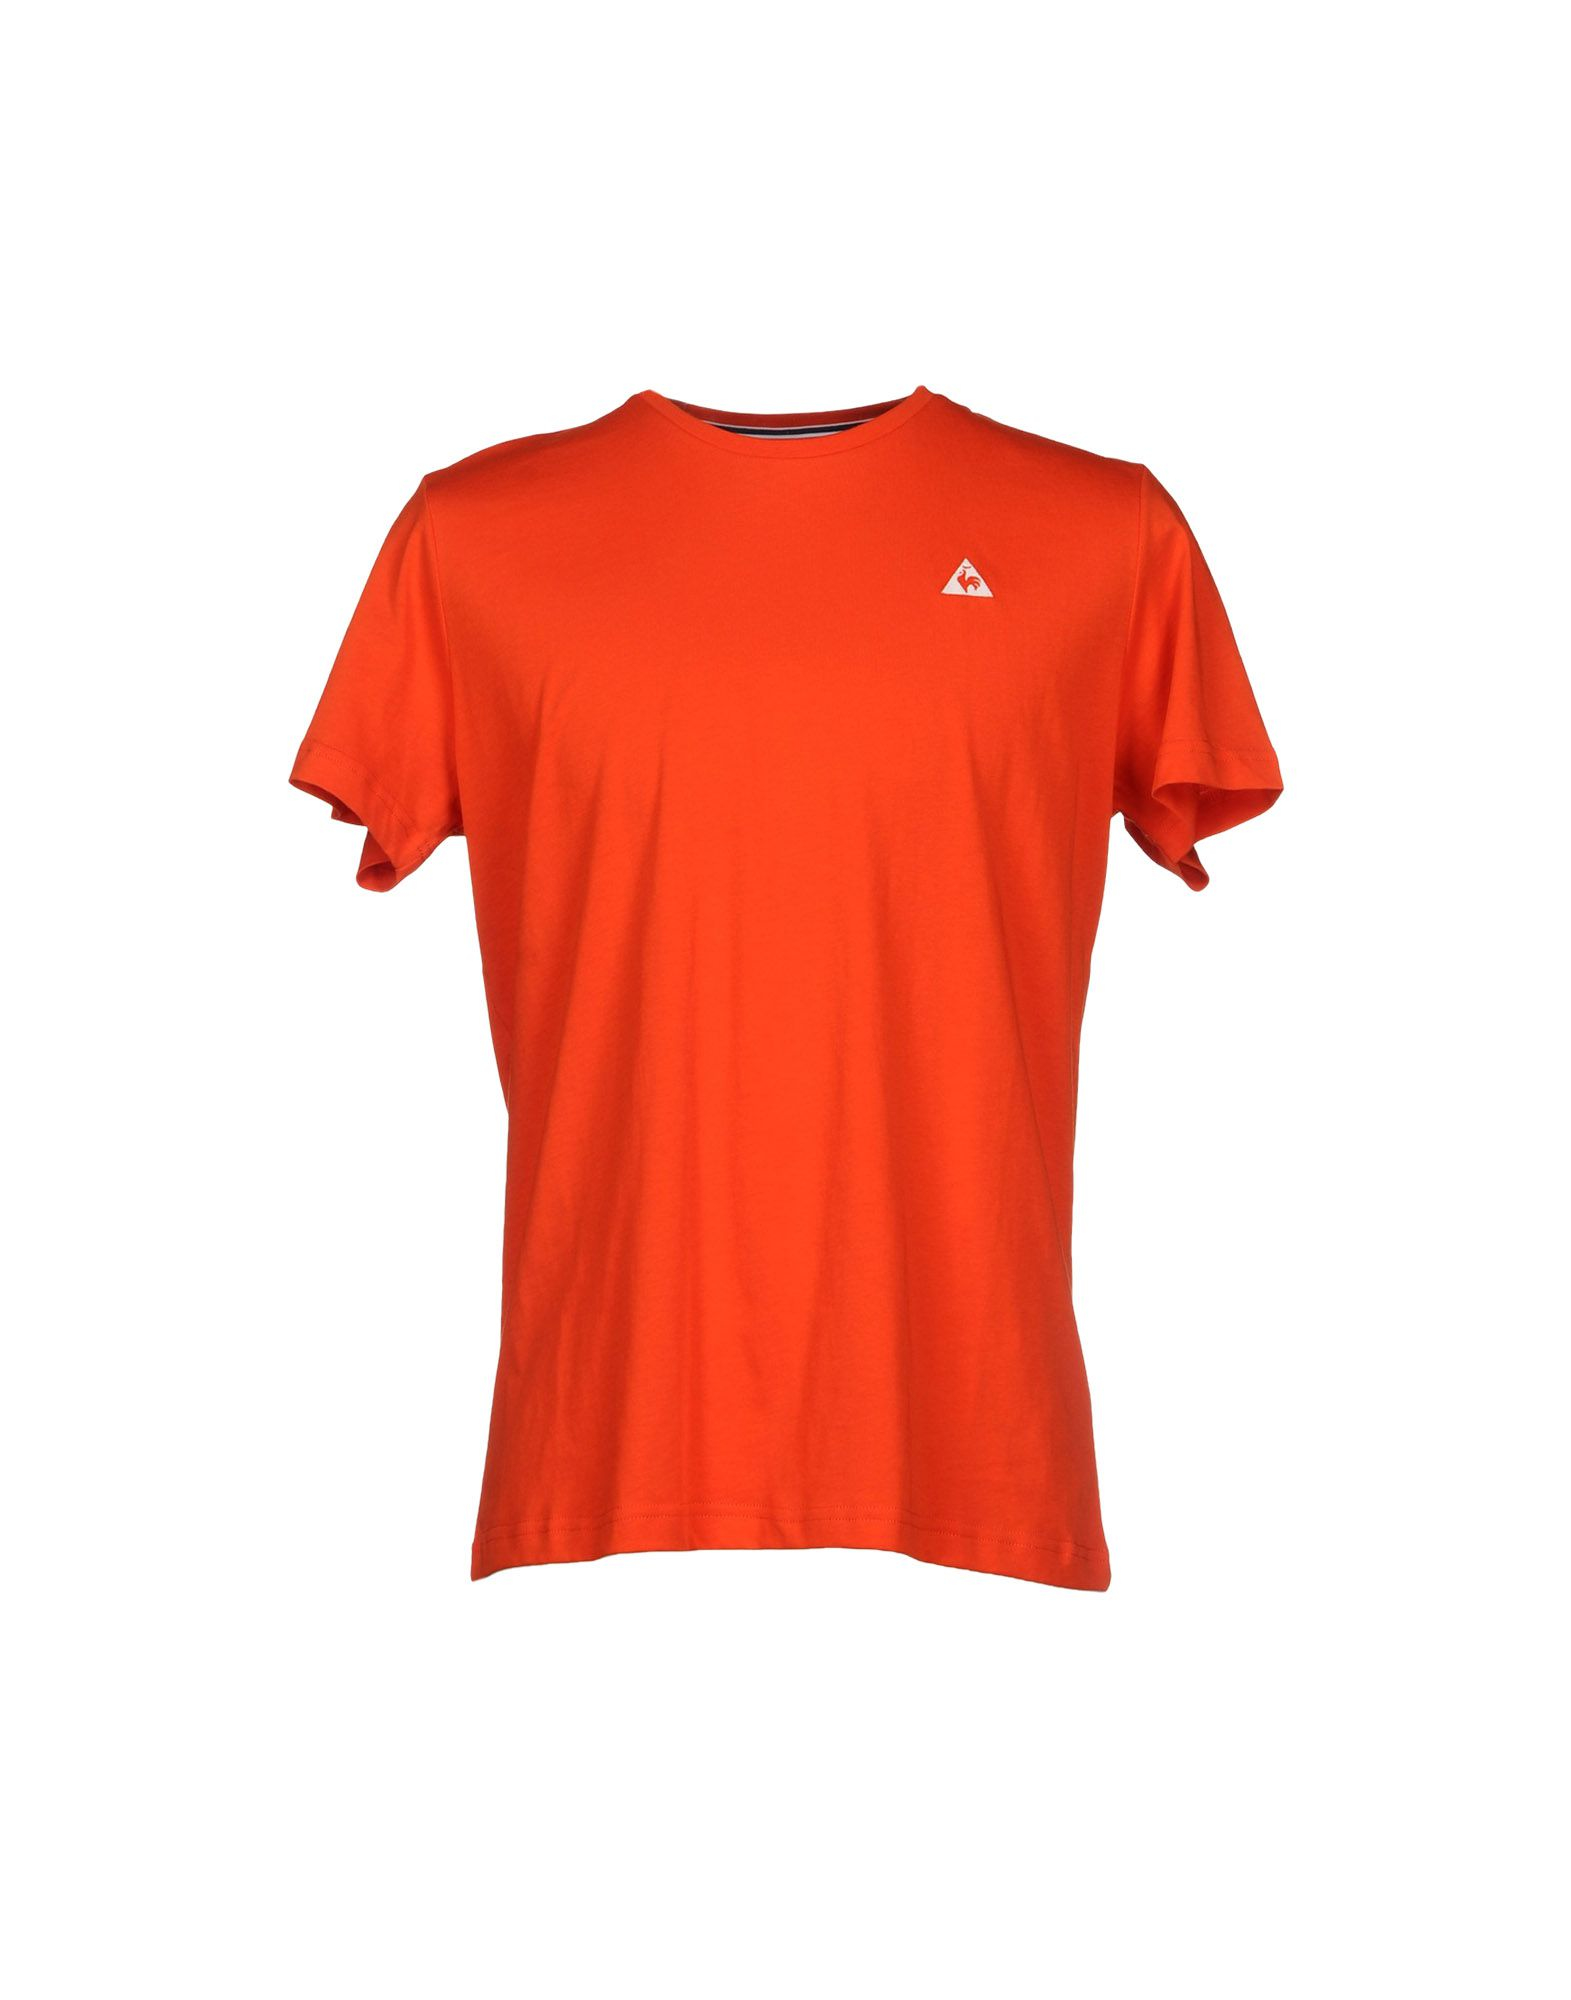 le coq sportif shirt - photo #35